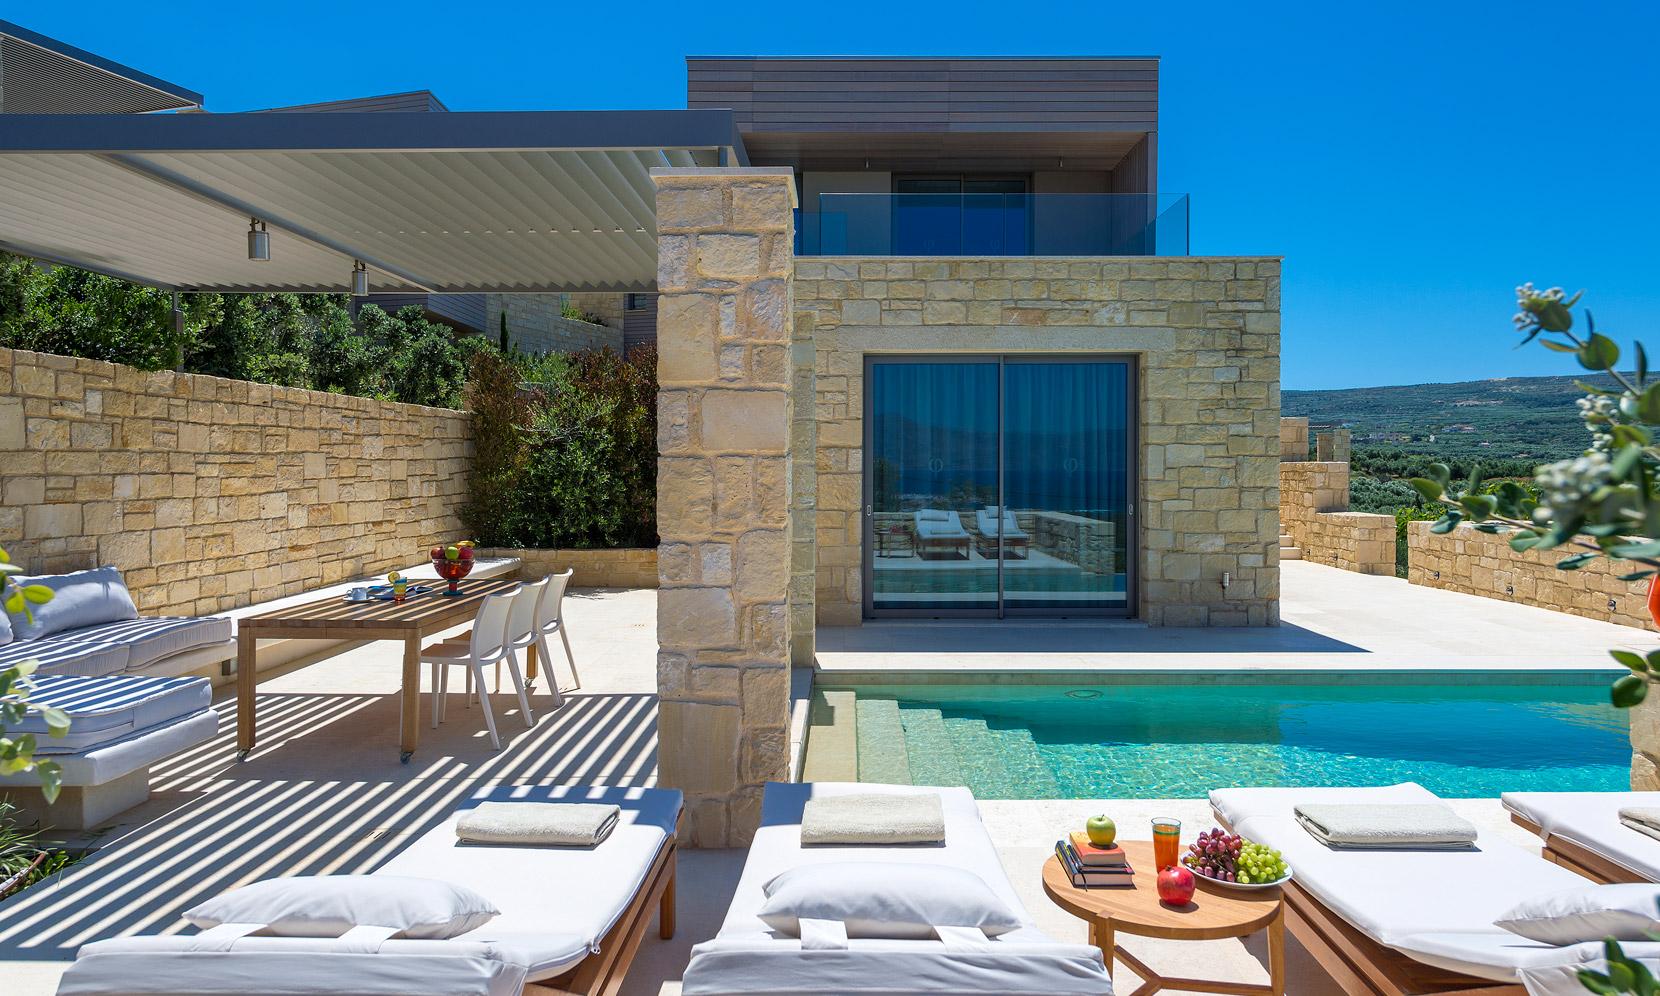 Crete Villa Cantaloupe jumbotron image